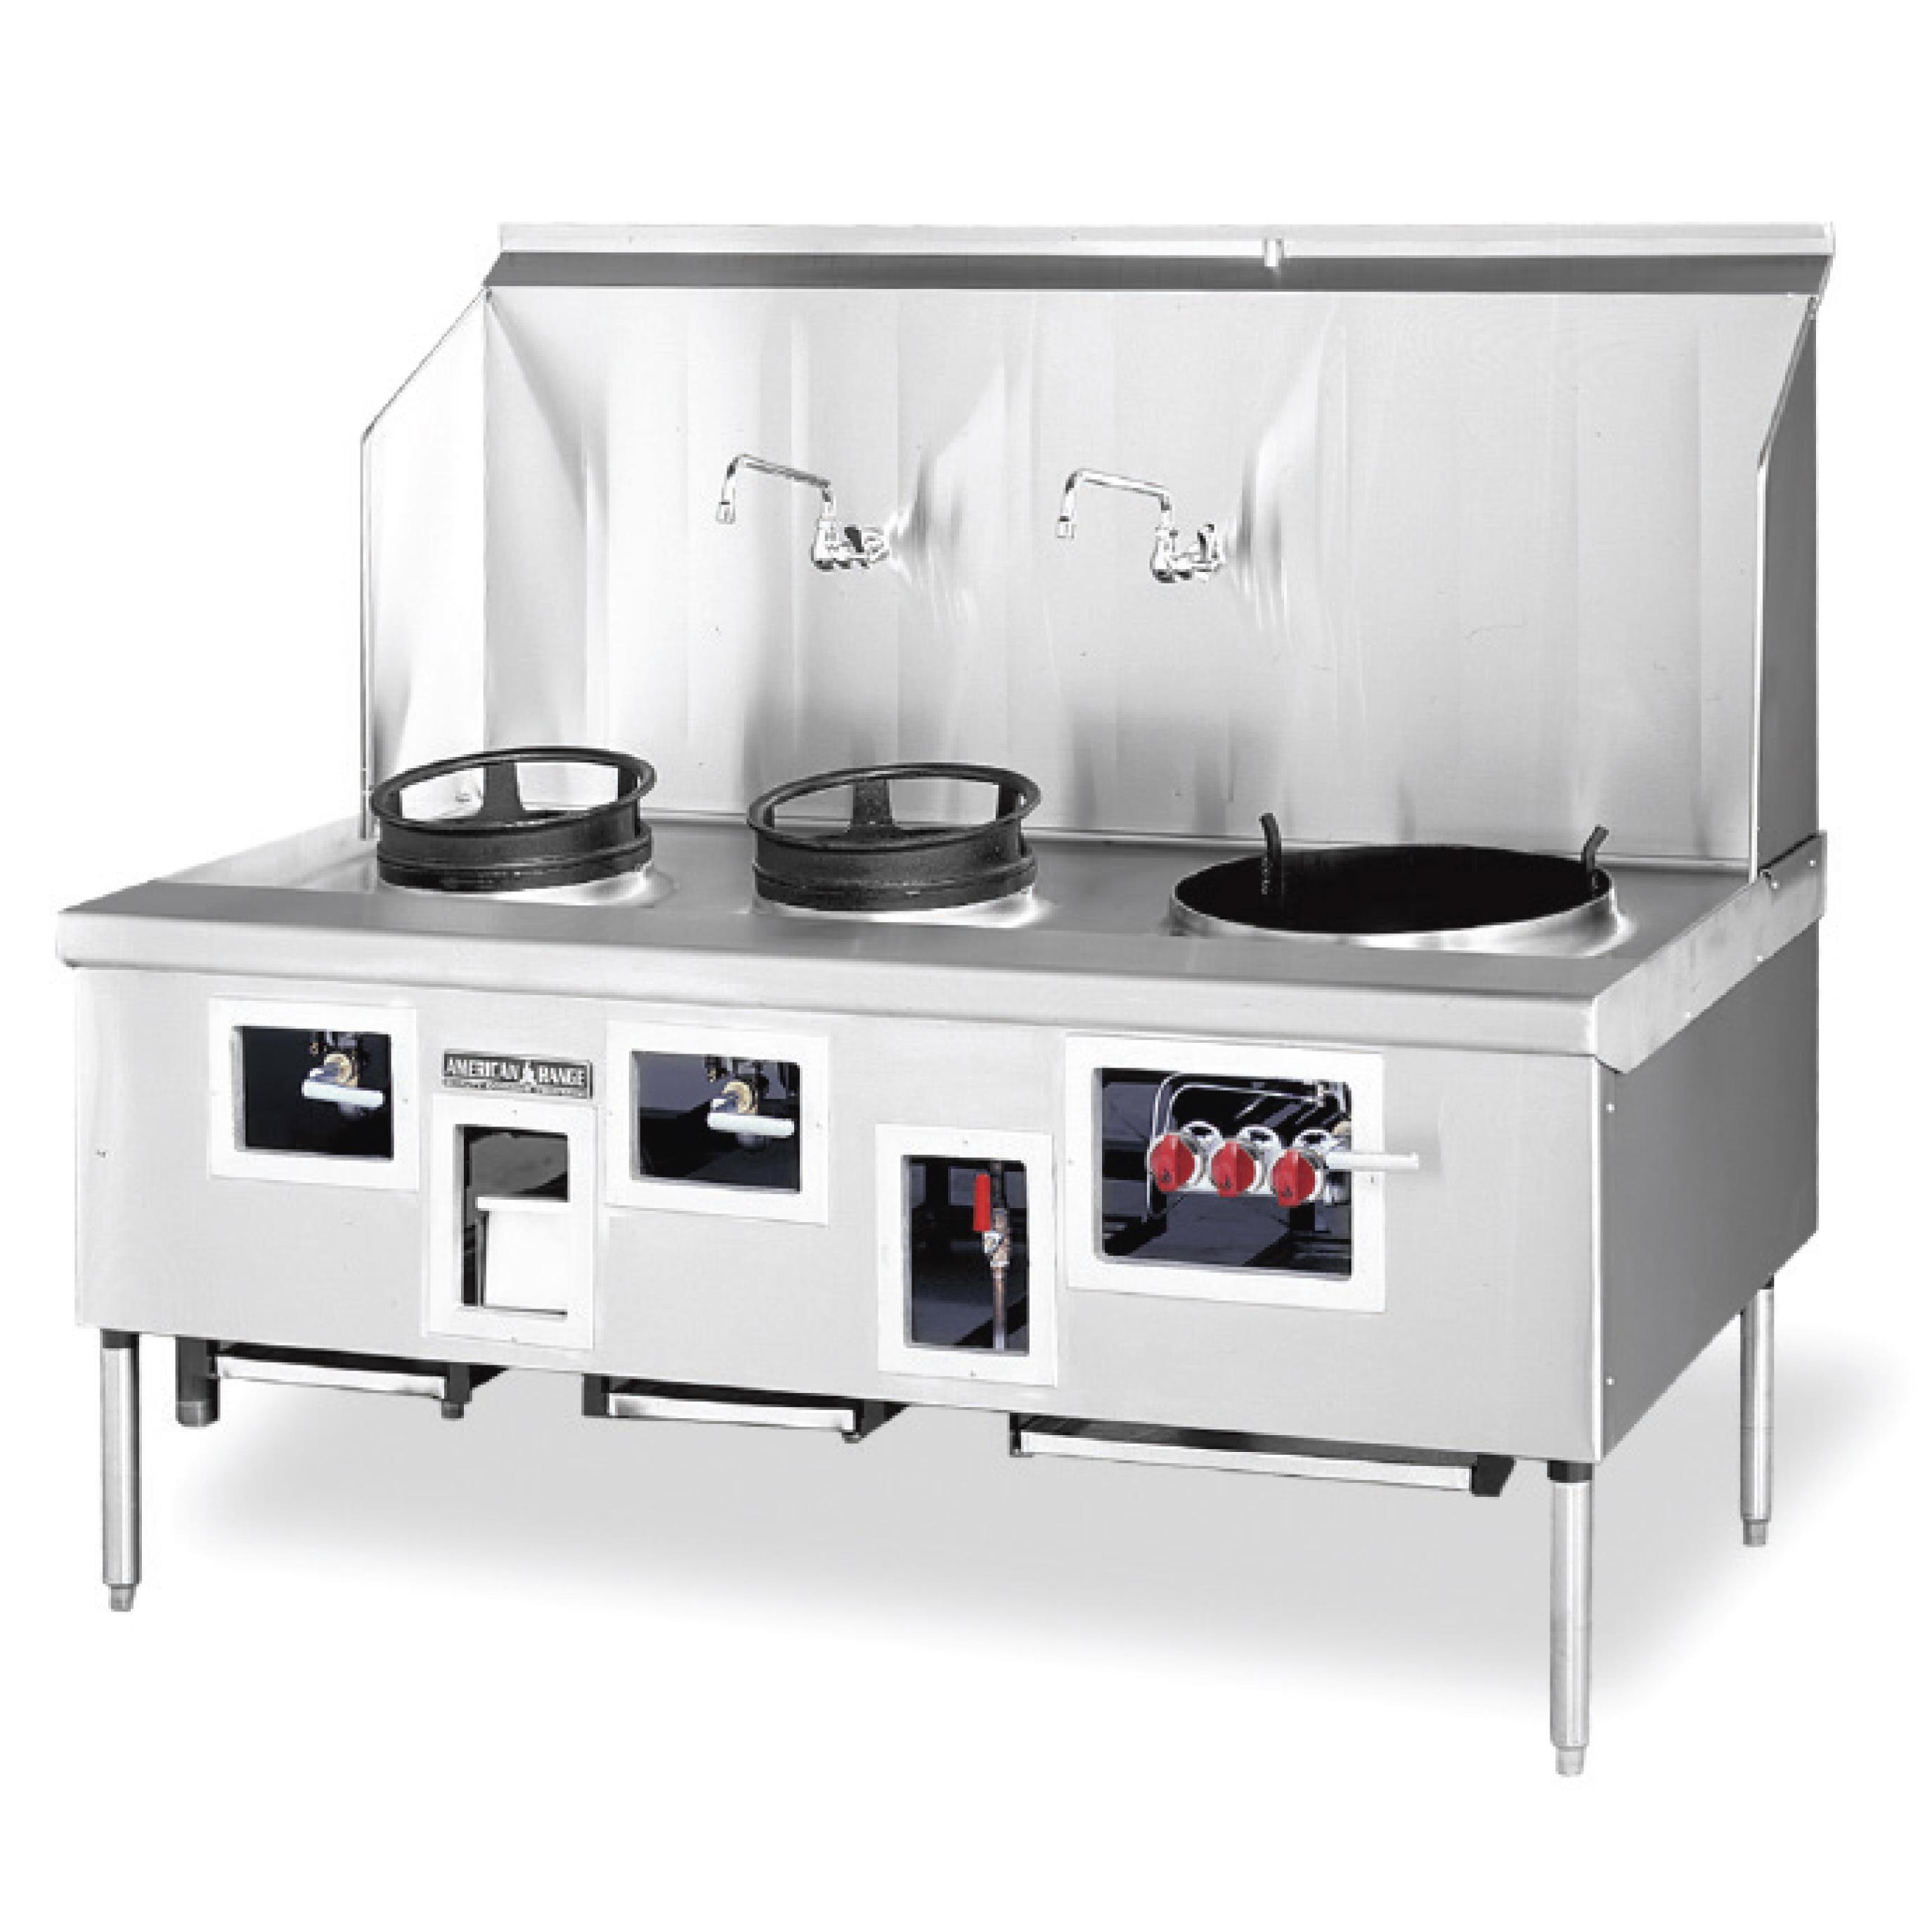 American Range ARCR-8 range, wok, gas